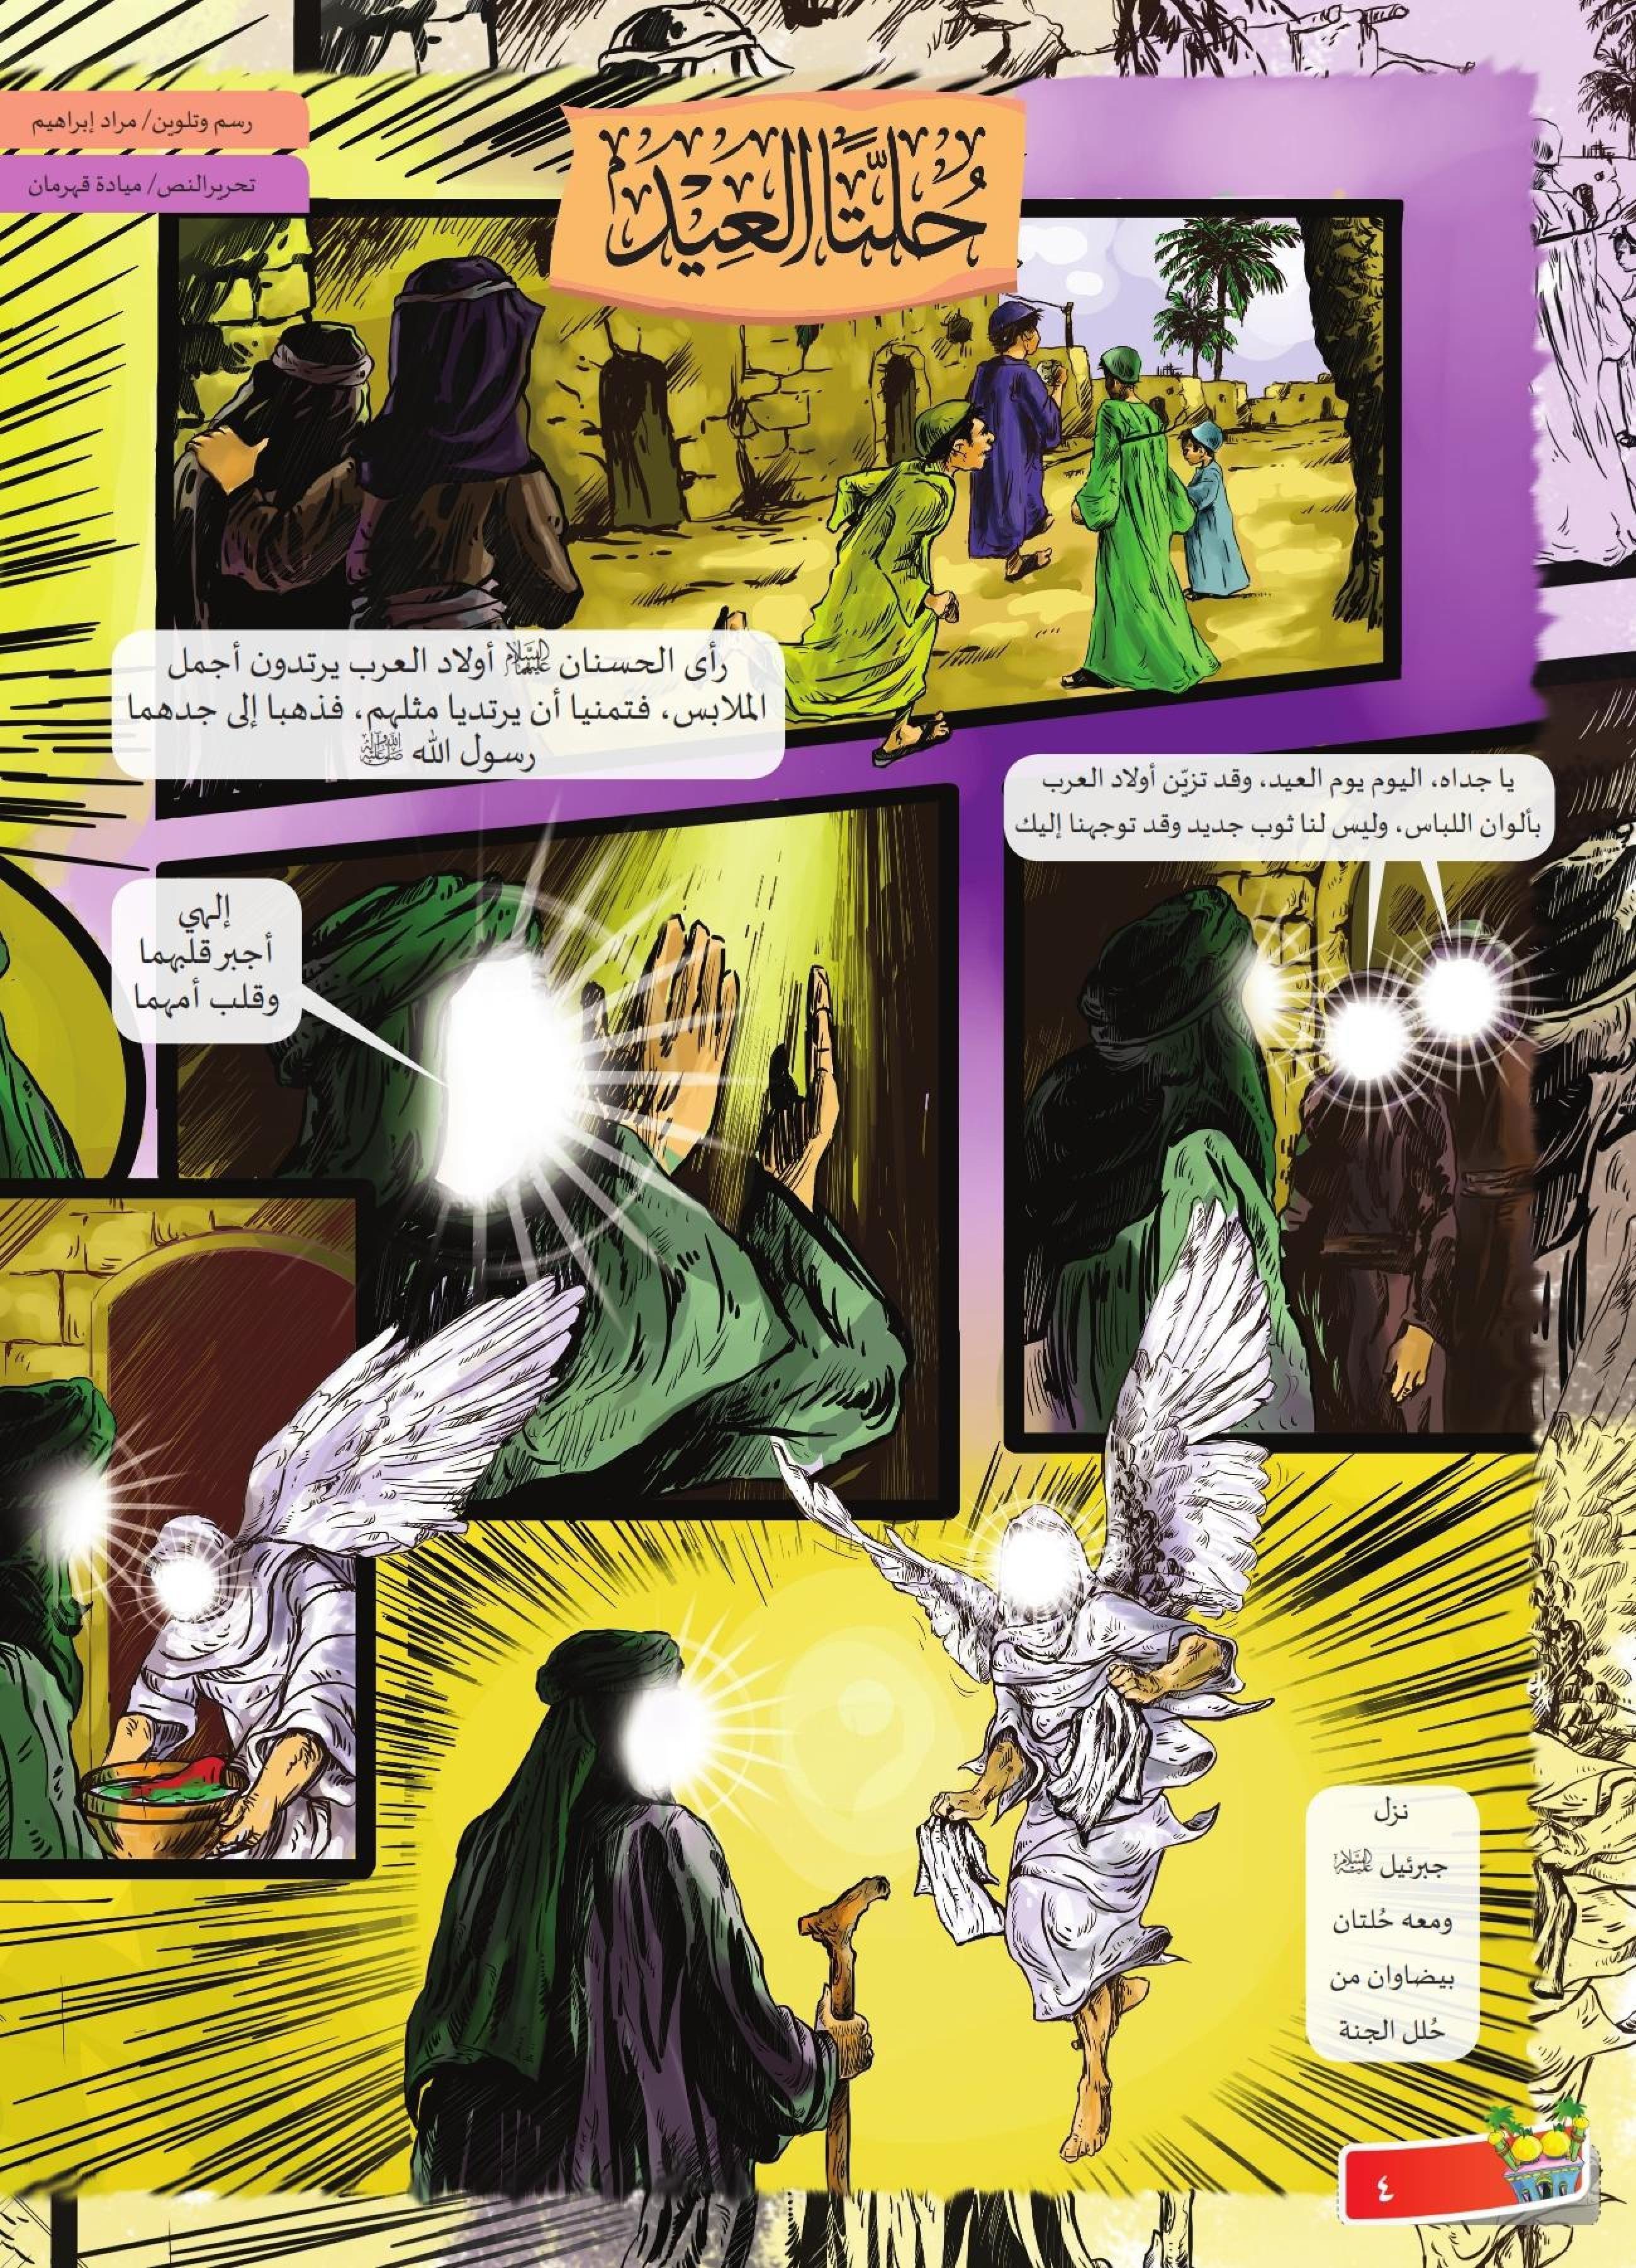 Pin By بسم الله الرحمن الرحيم On عربي Comic Book Cover Comic Books Book Cover